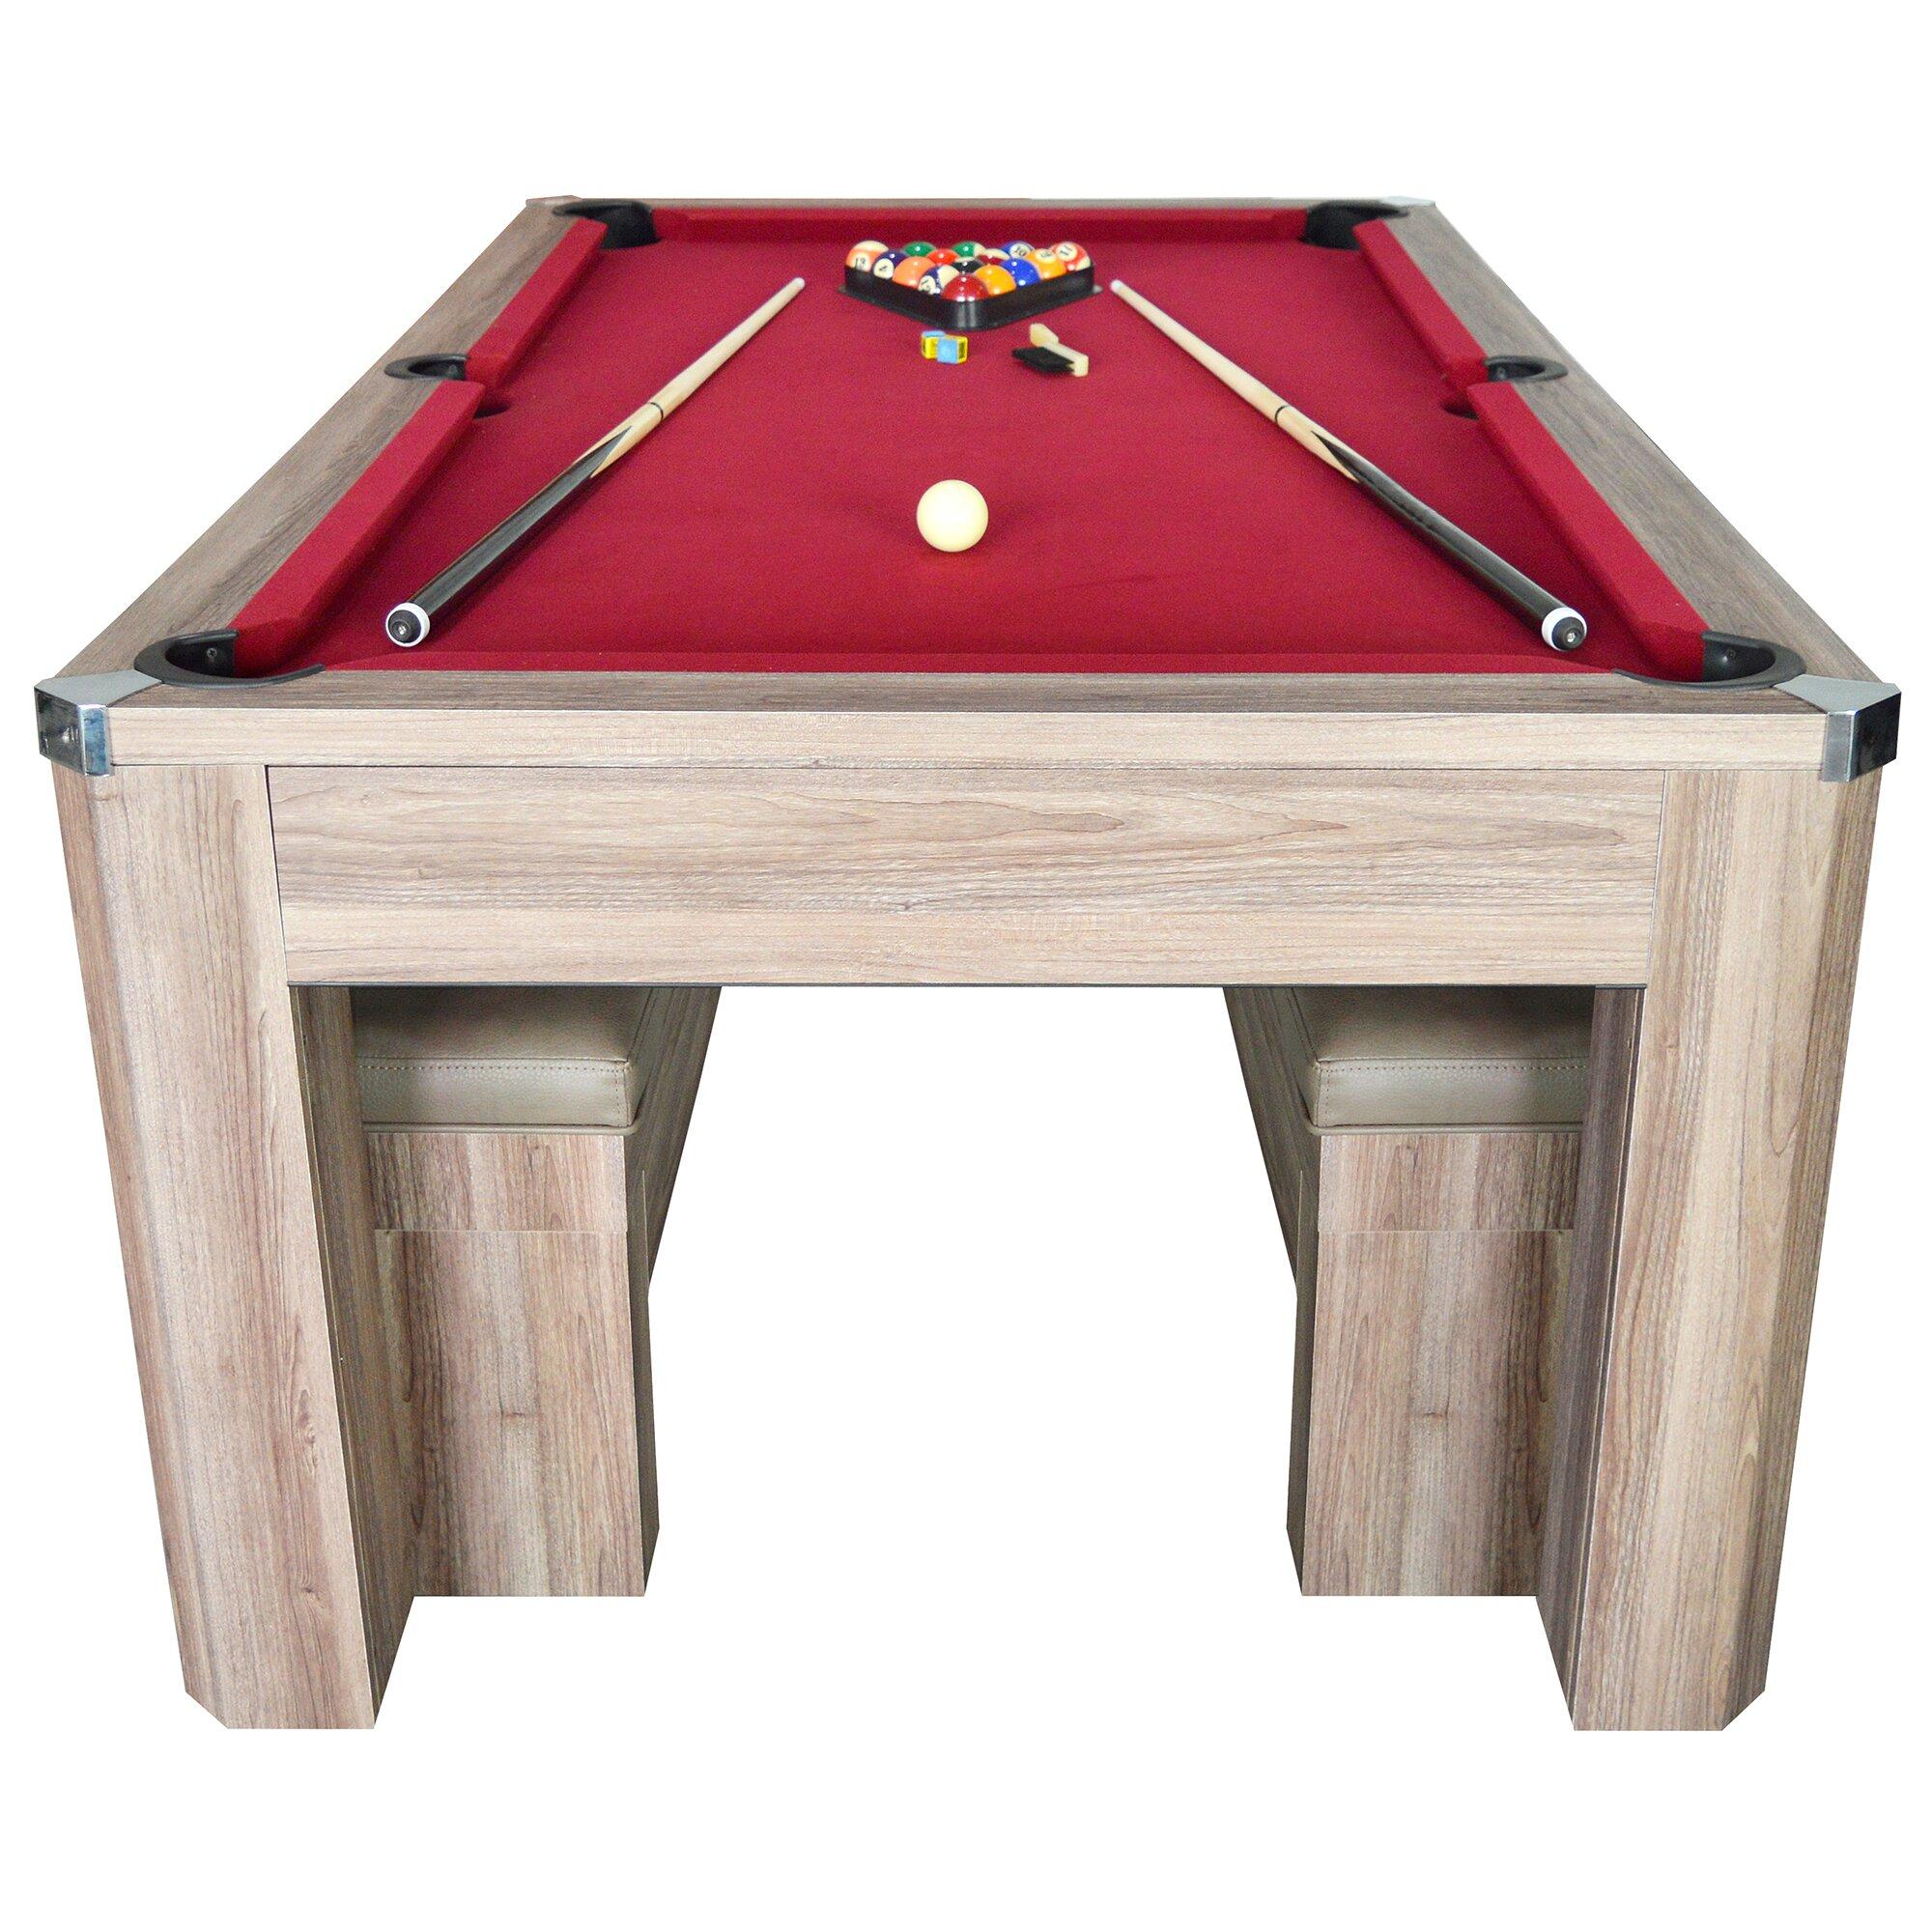 Hathaway Games Newport 7 Pool Table Combo Set amp Reviews  : Hathaway Games Newport 7 Pool Table Combo Set from www.wayfair.com size 2000 x 2000 jpeg 762kB